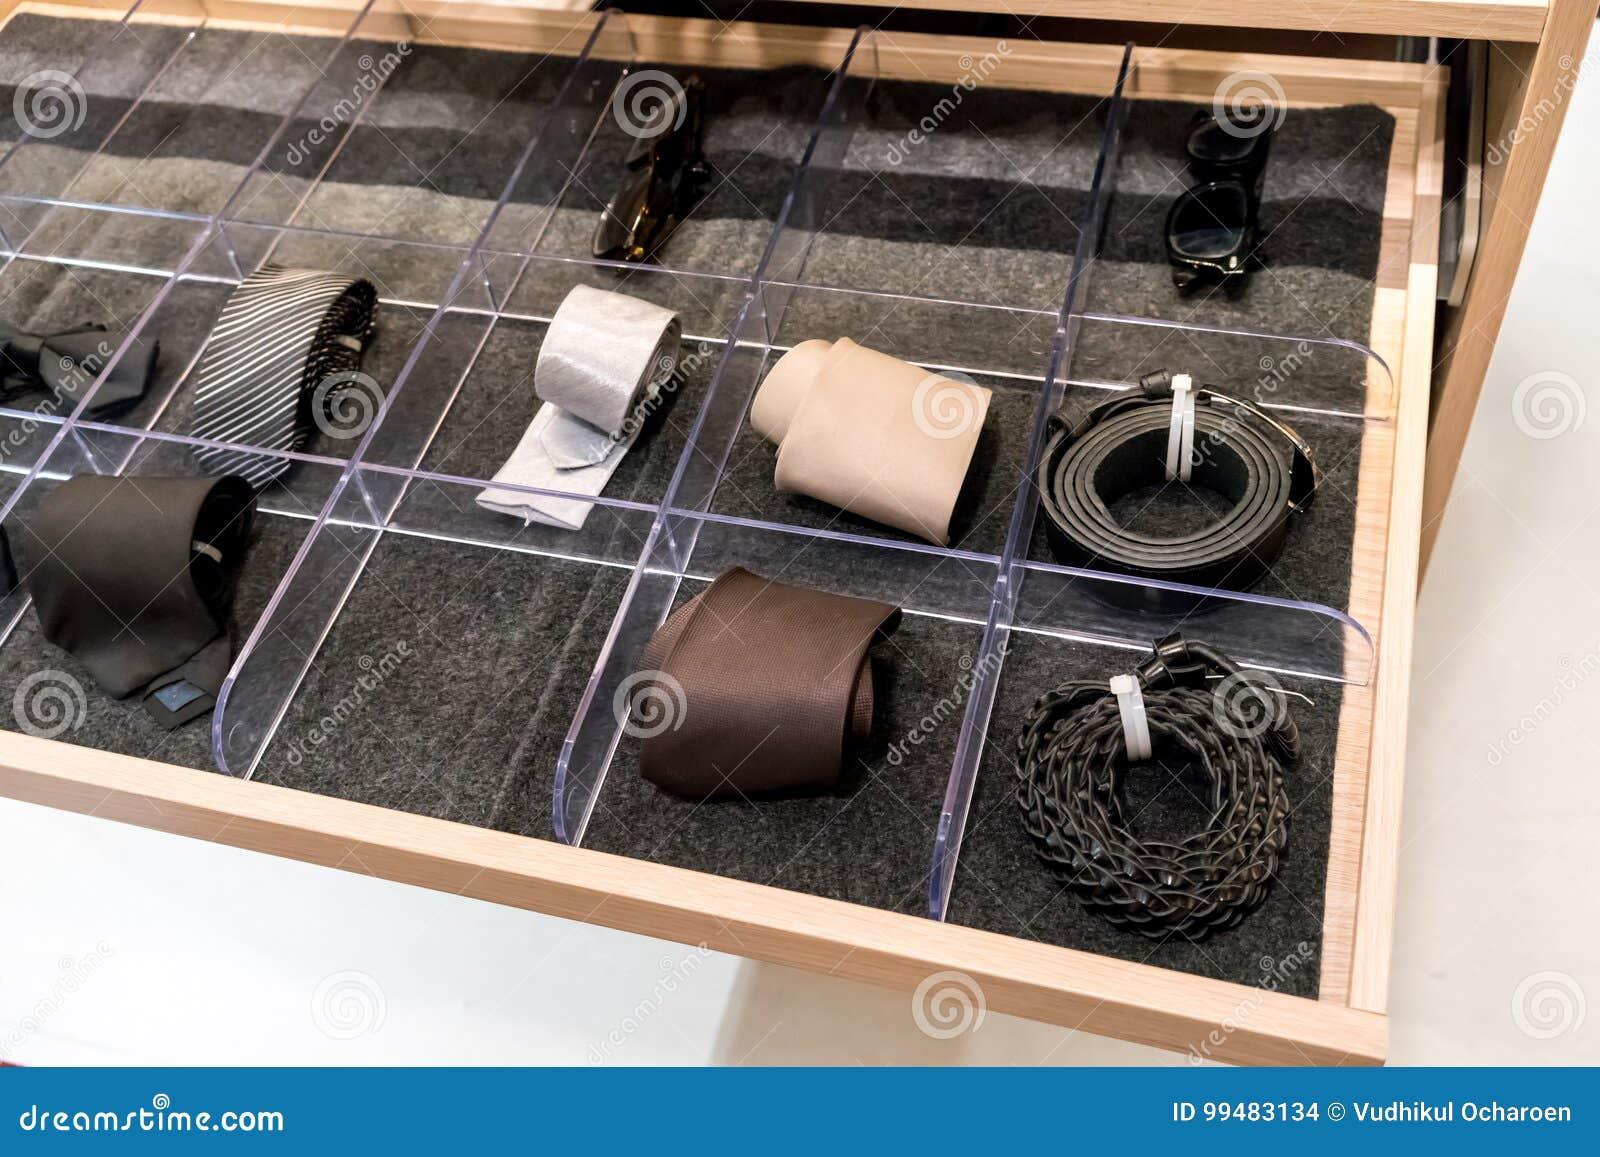 Mens accessories in closet drawer